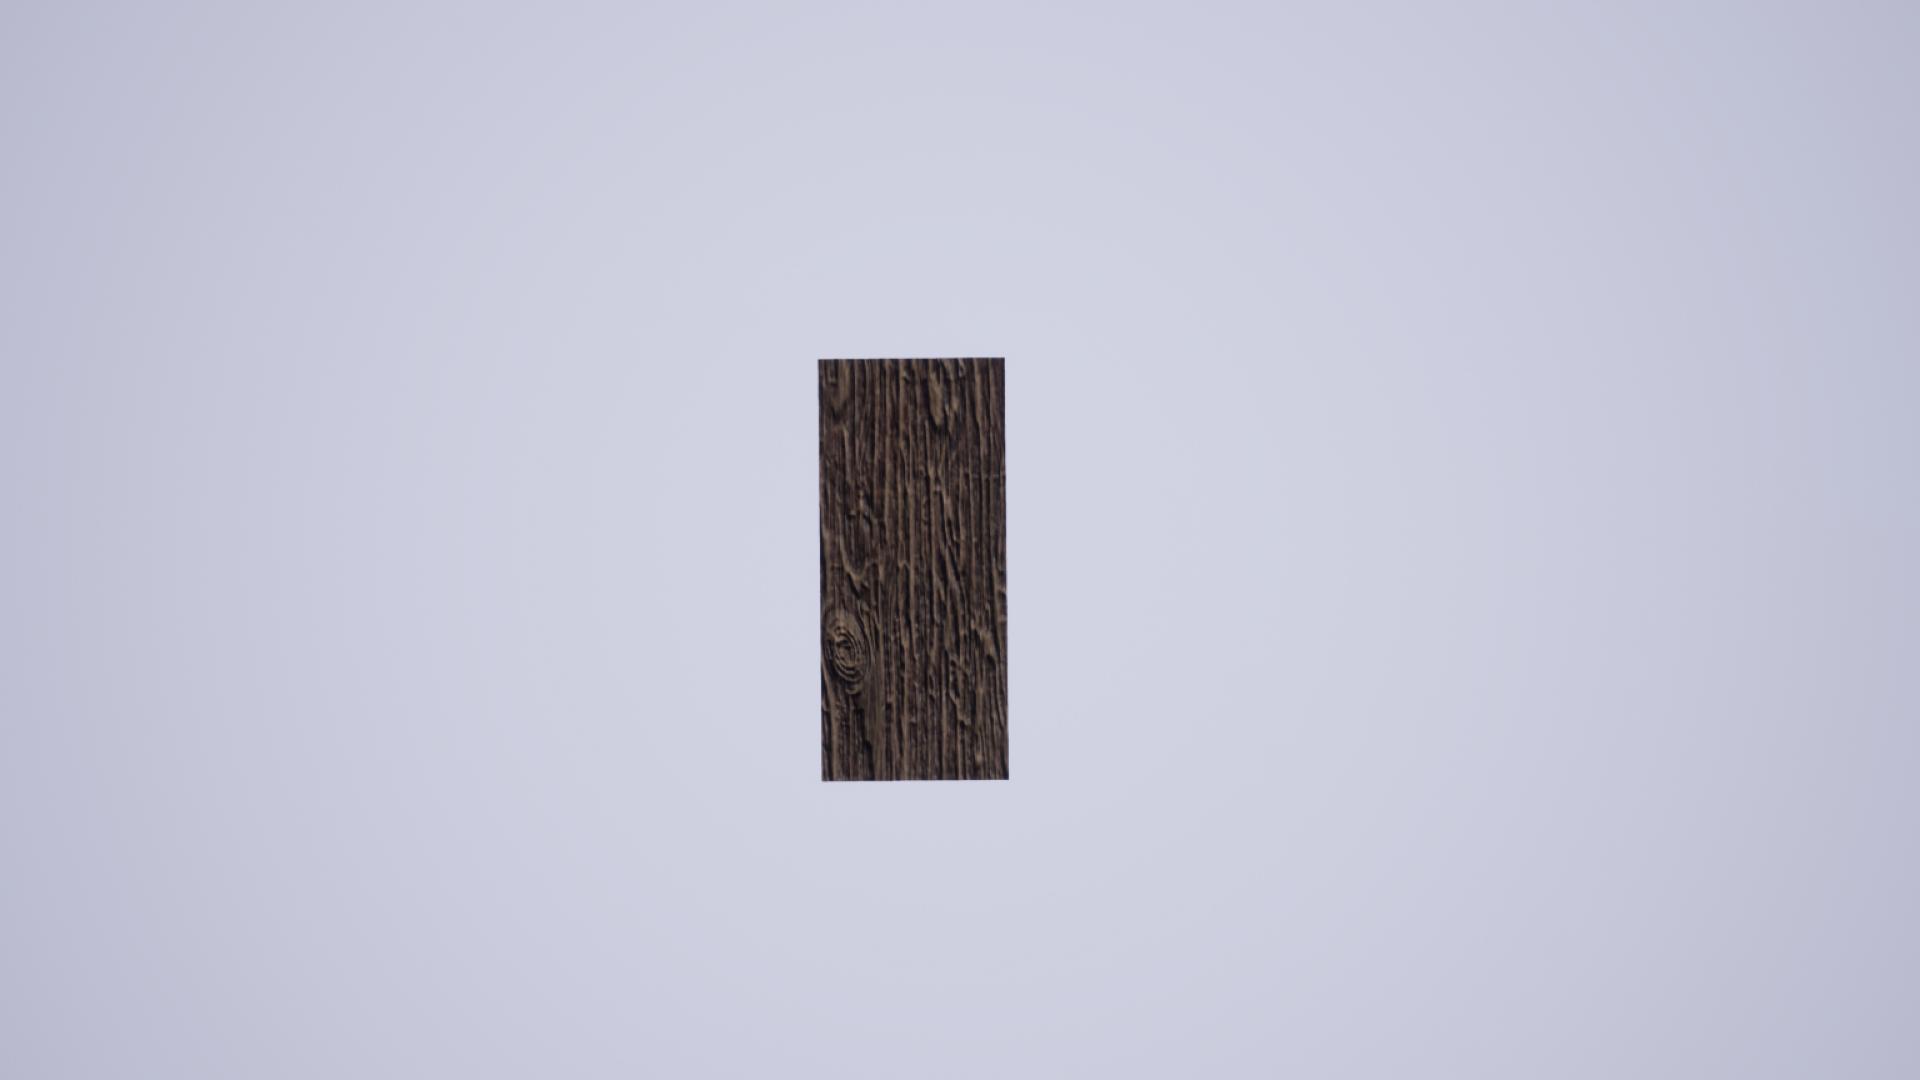 weak wooden block